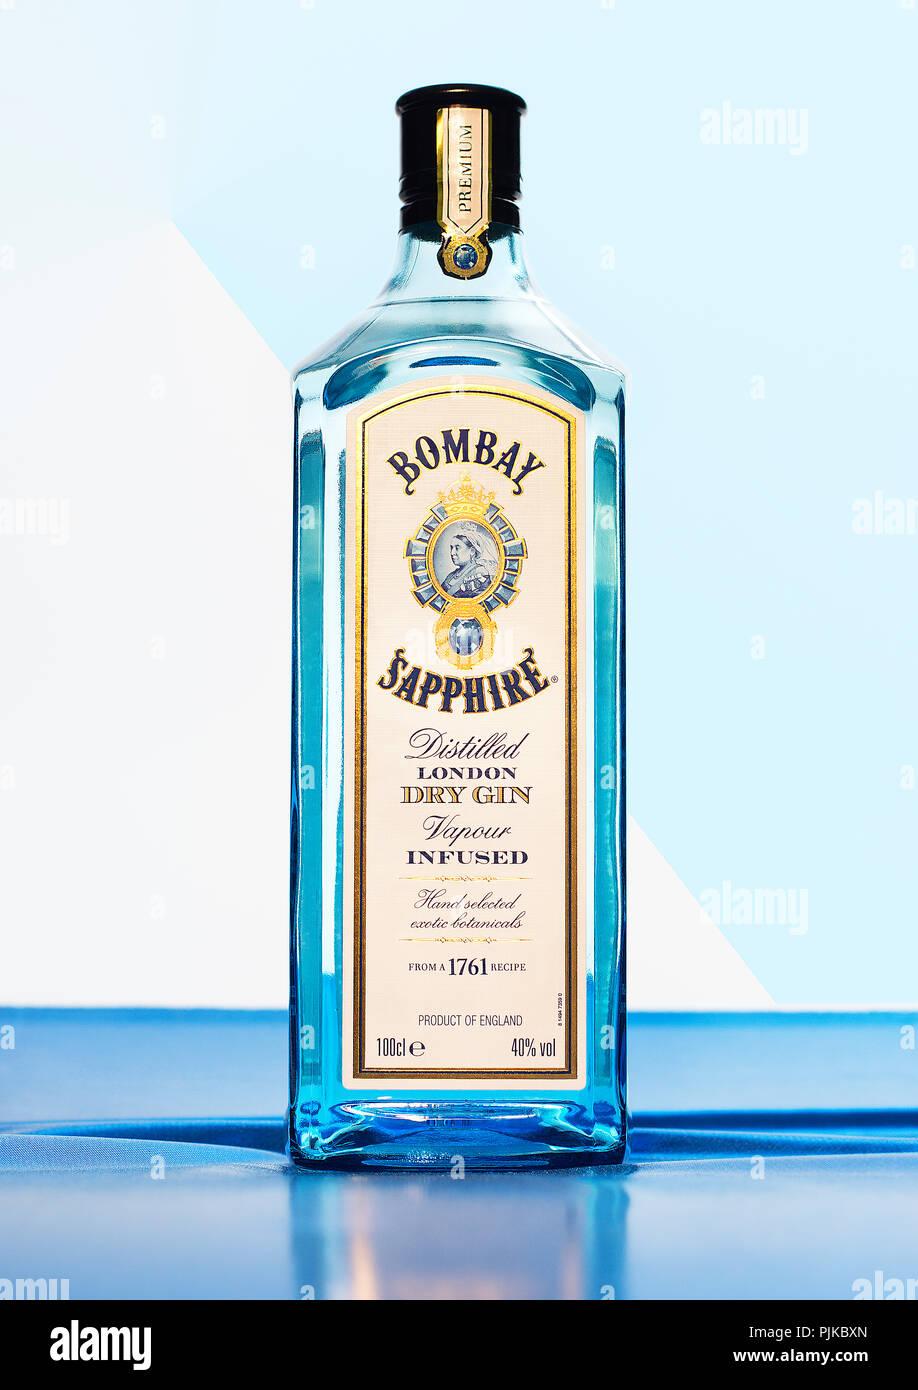 Bombay Sapphire Gin - Stock Image